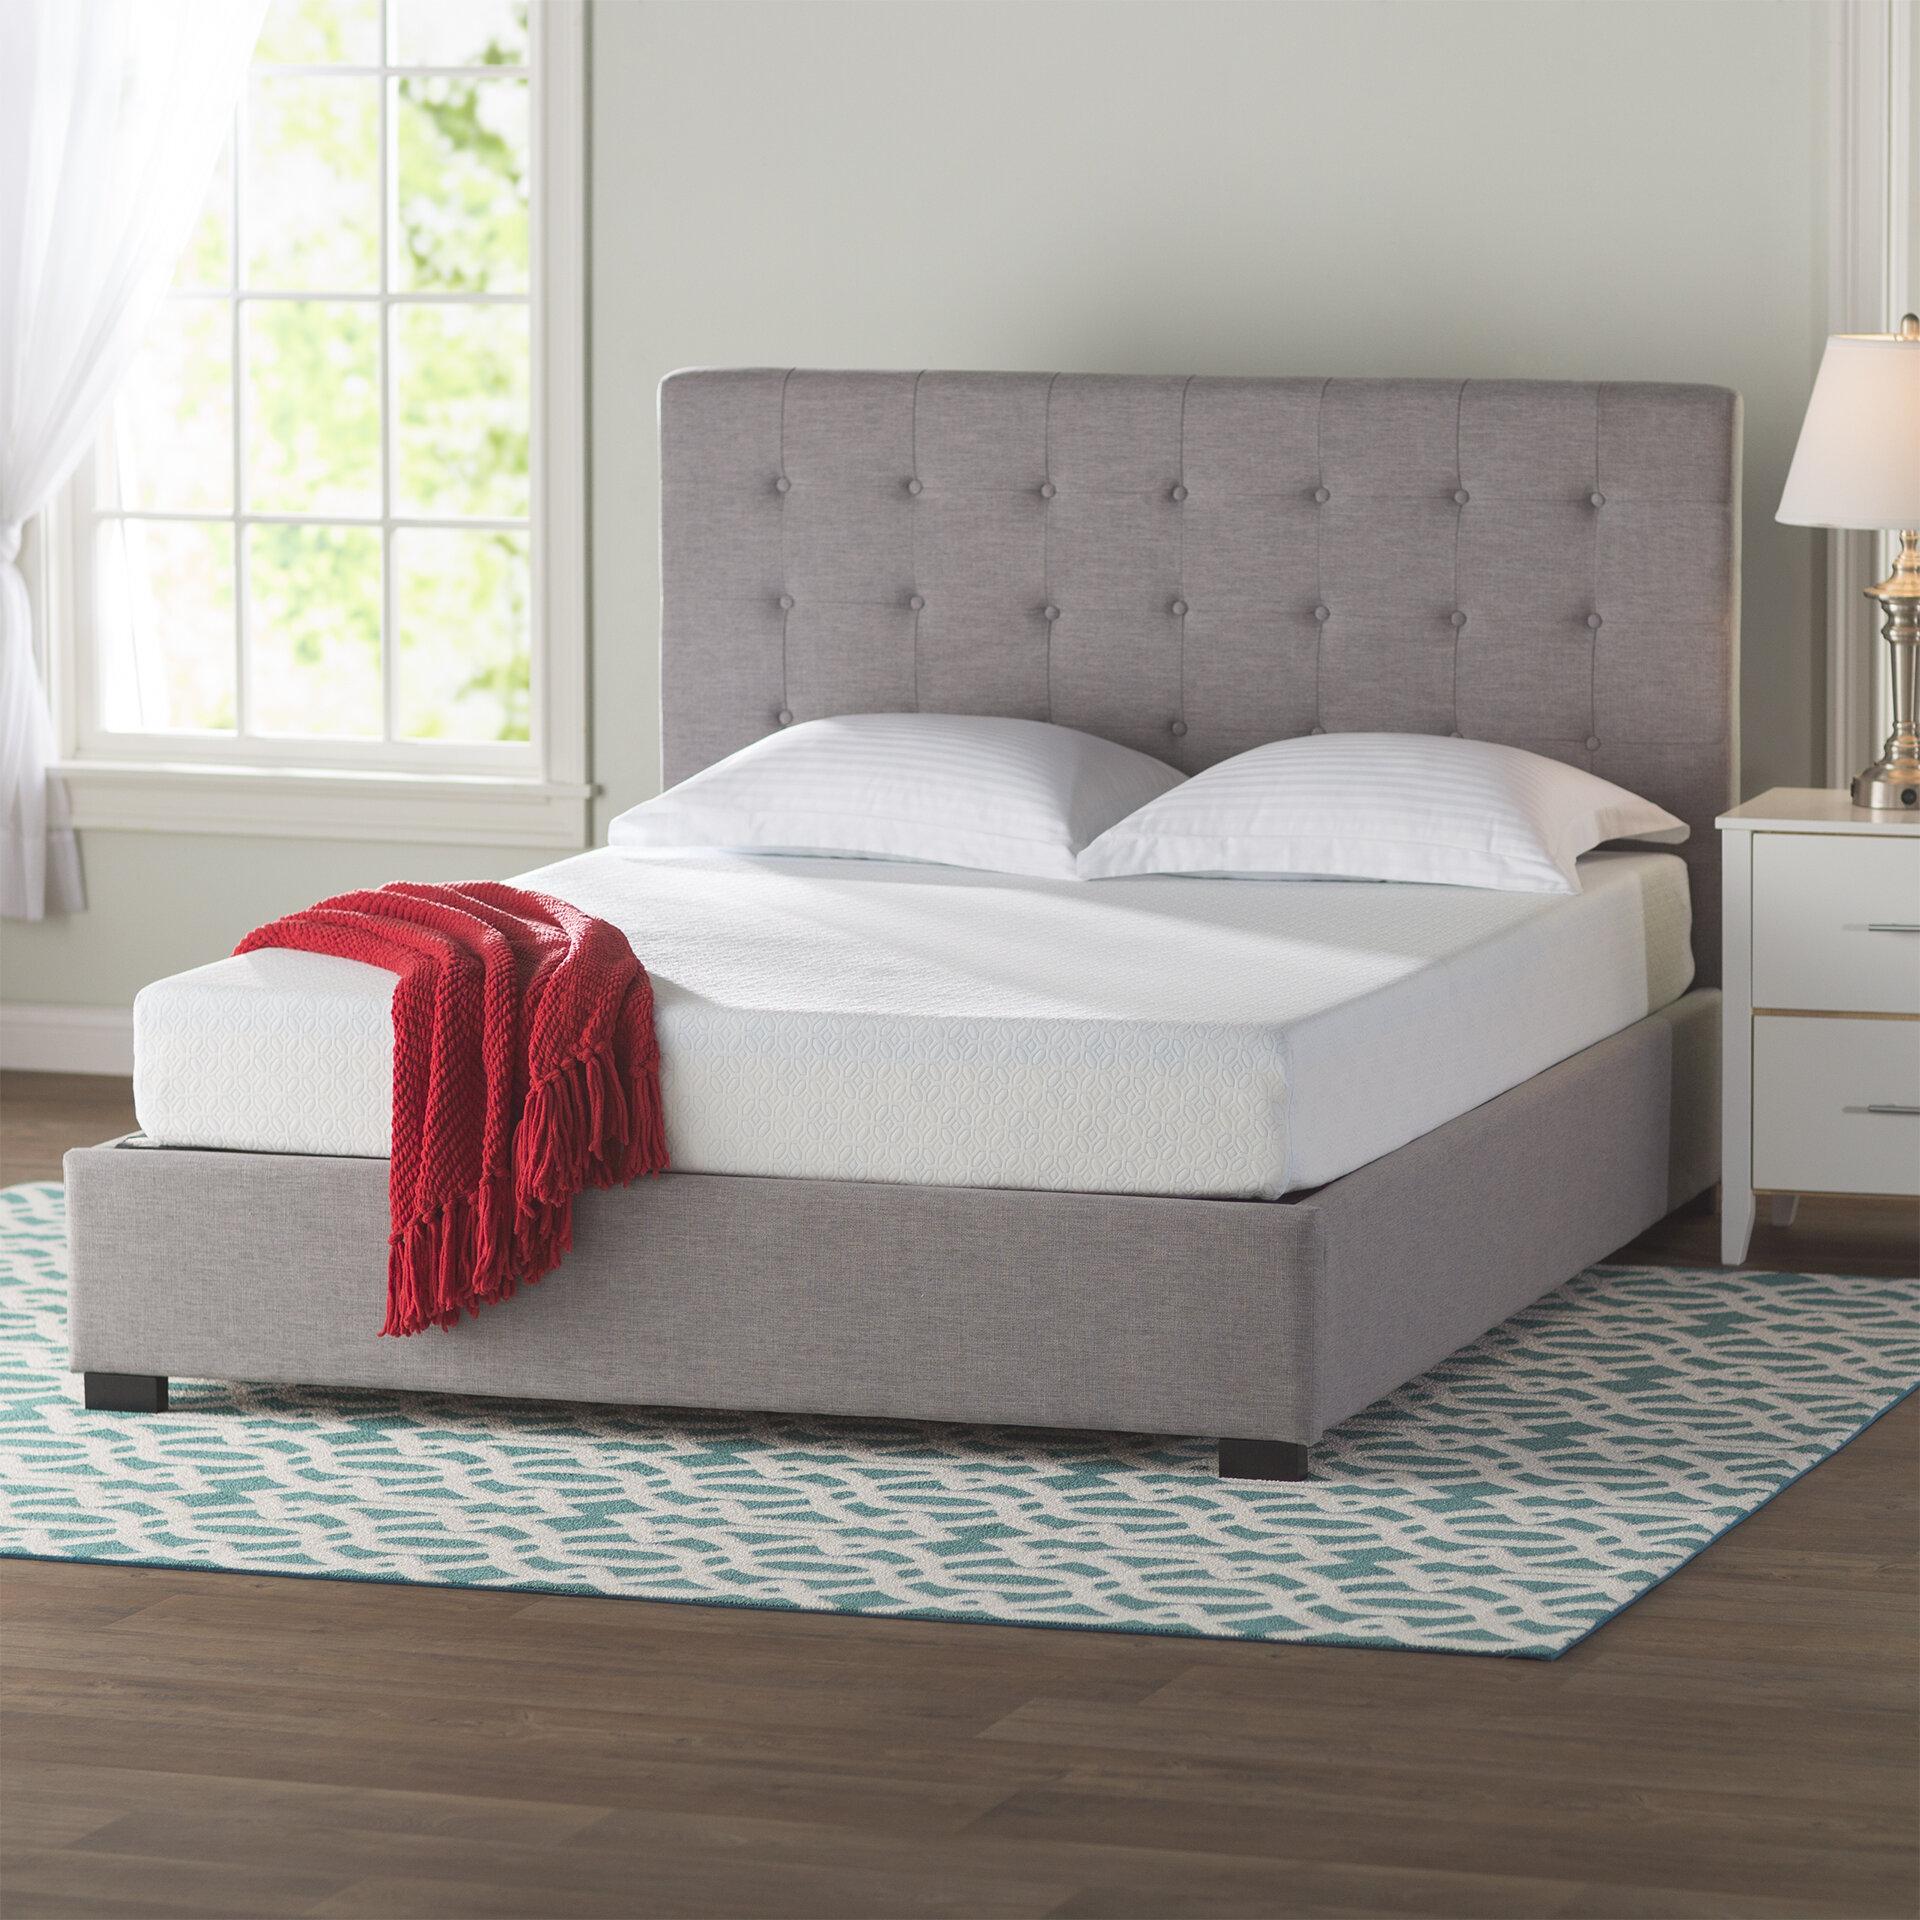 Www Mayfair Com: Wayfair Sleep™ Wayfair Sleep Gel Memory Foam Mattress